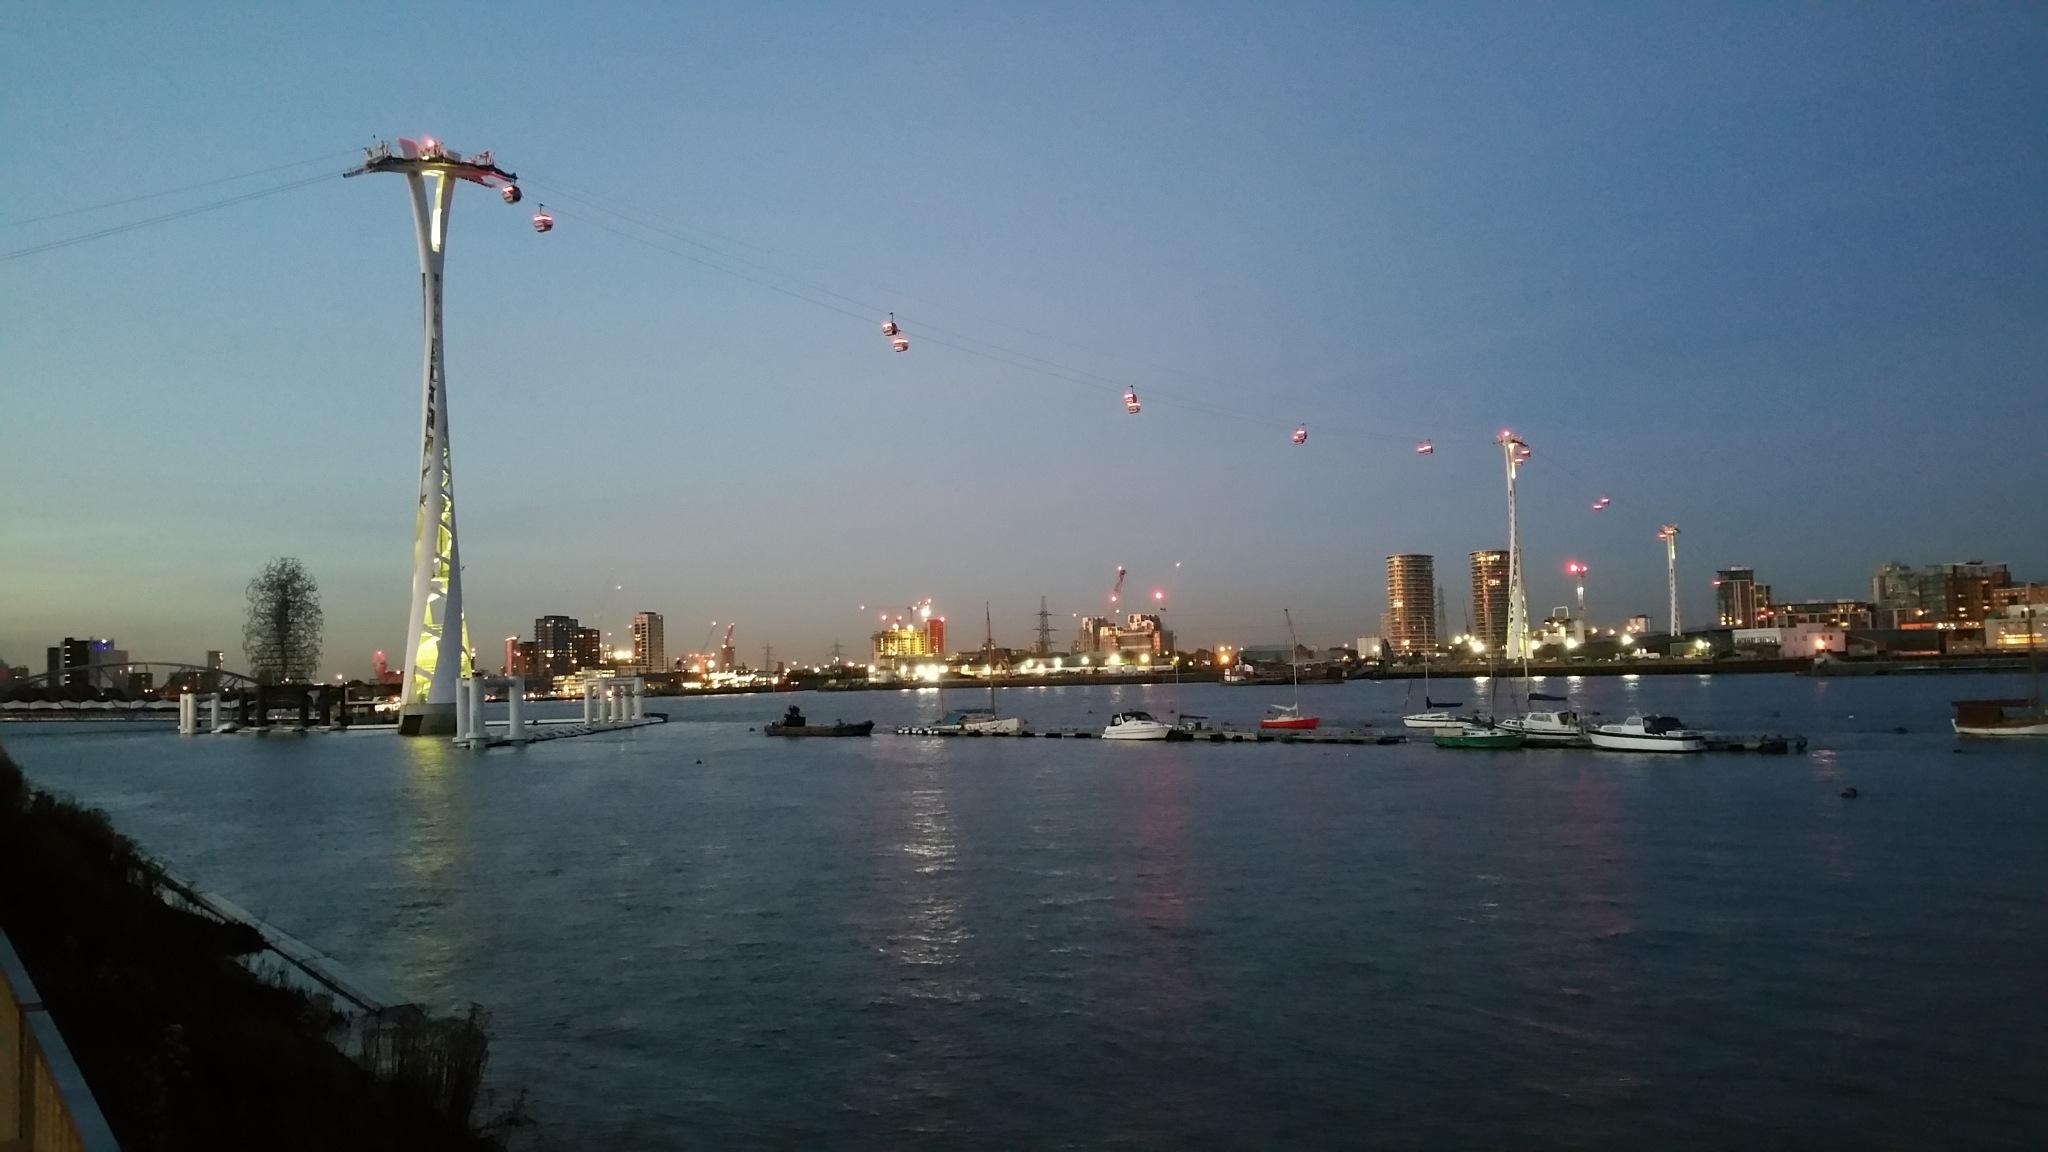 Emirates Greenwich Peninsula by MarioCalin